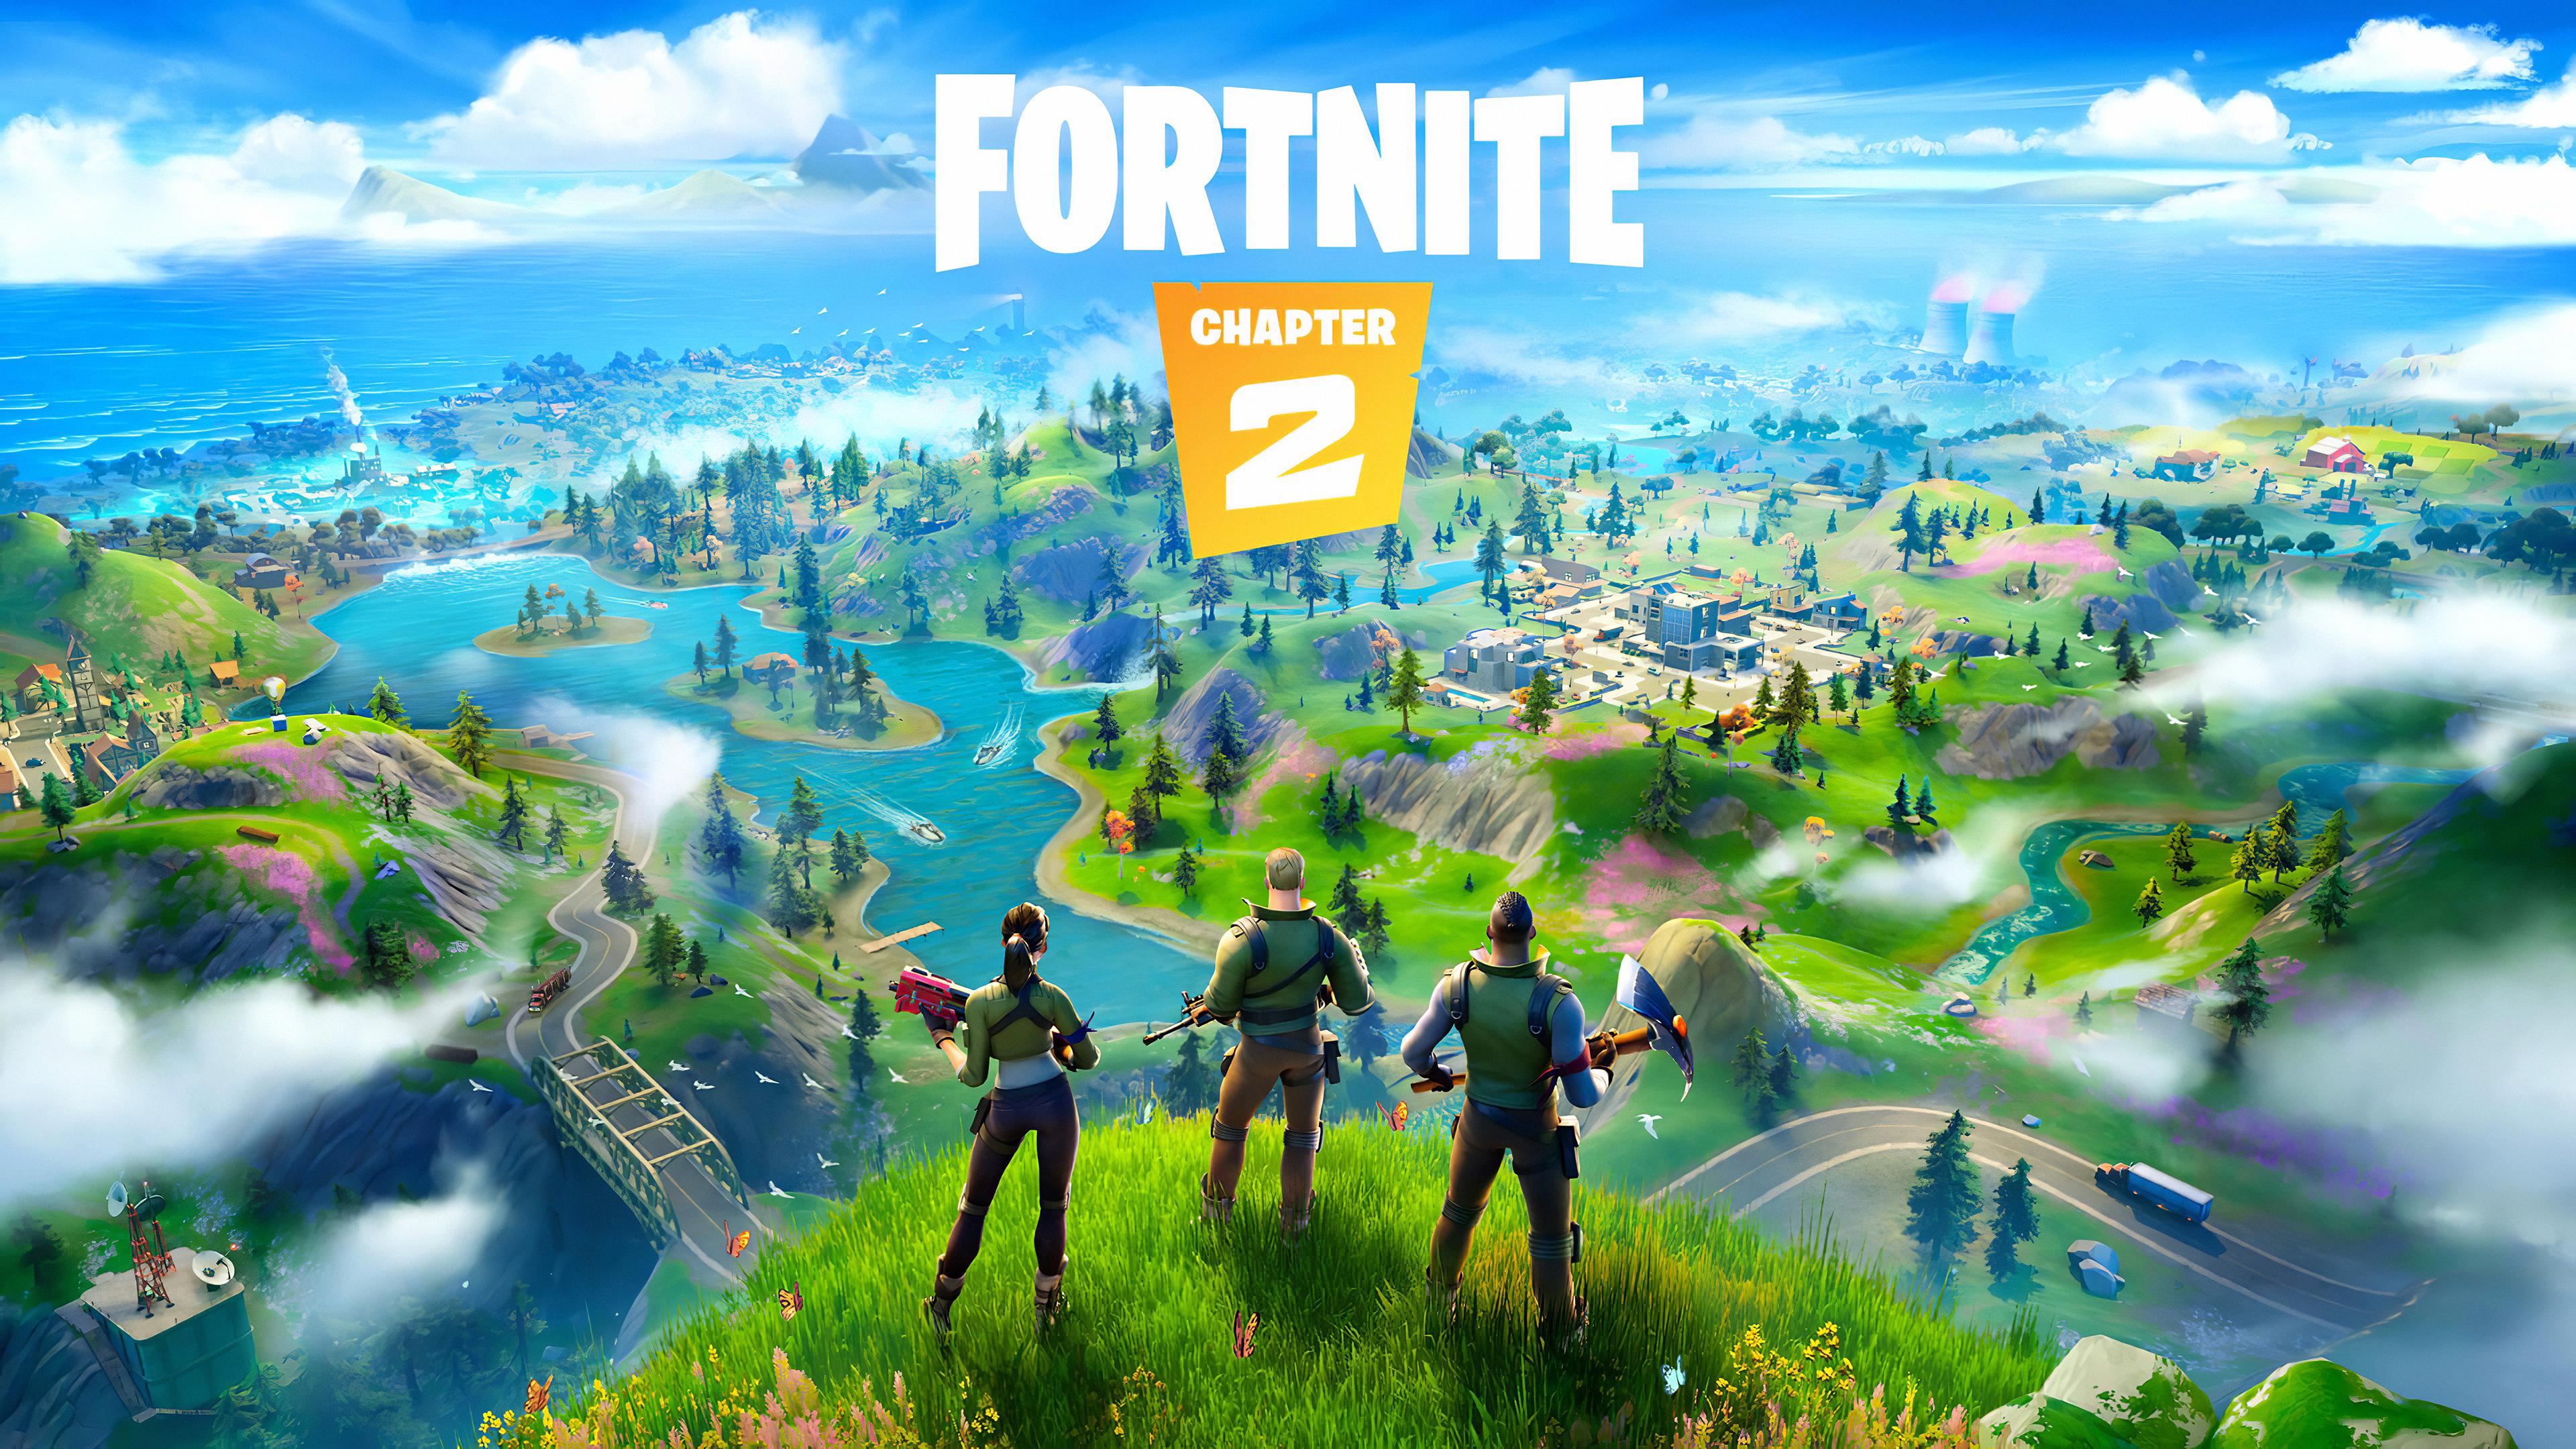 Fortnite Chapter 2 2019 4k, HD Games, 4k Wallpapers ...